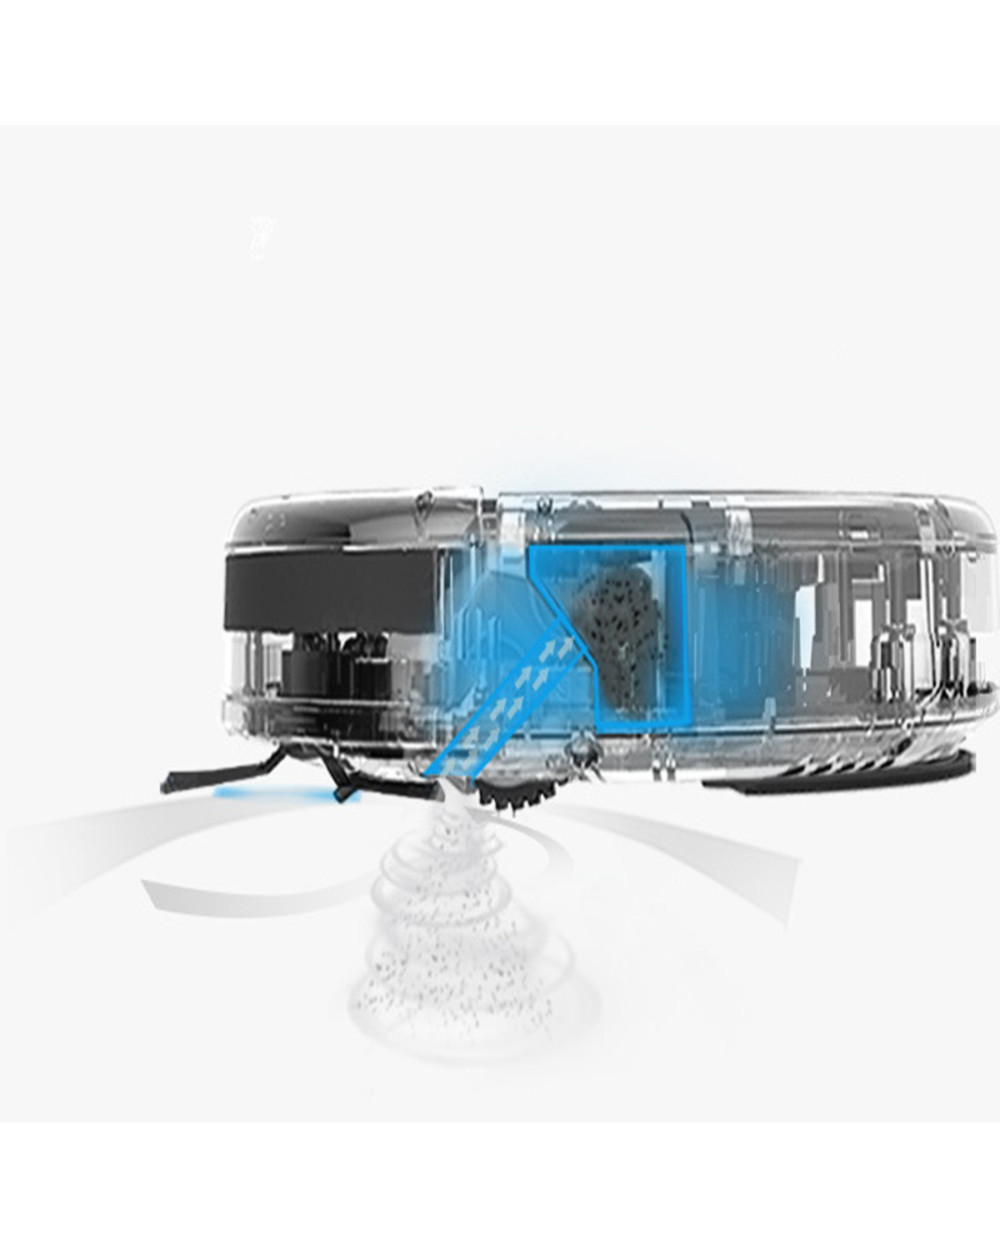 Robot Vacuum Cleaner Robot Vacuum Cleaner 8